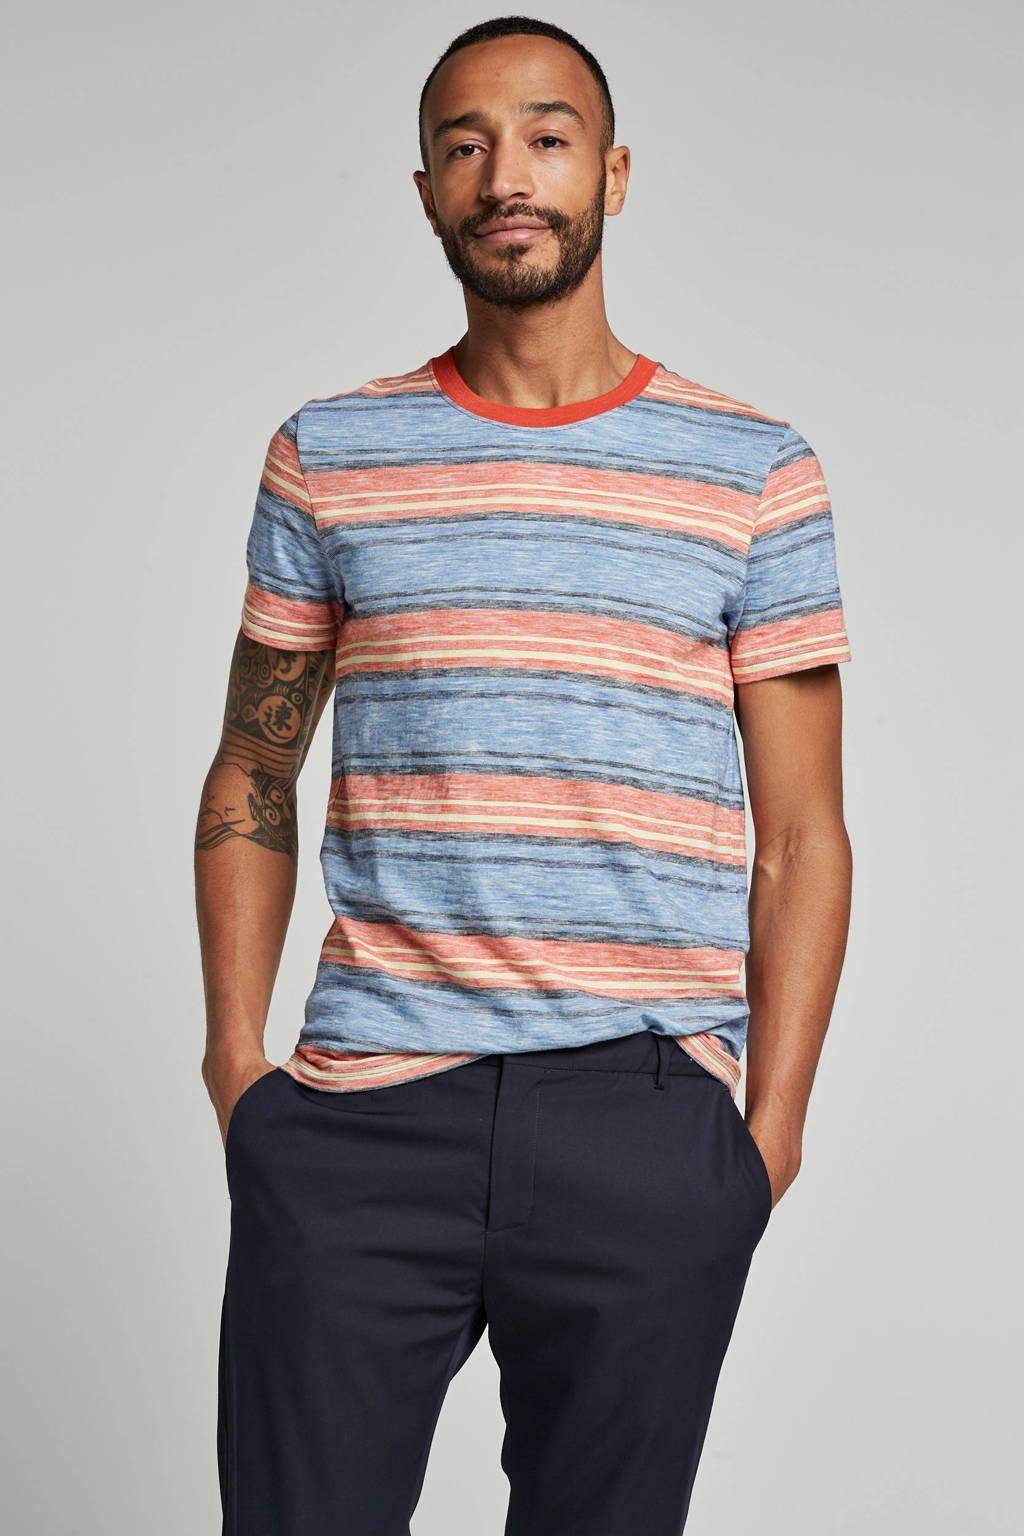 SELECTED HOMME T-shirt Kasper, Oranje/blauw